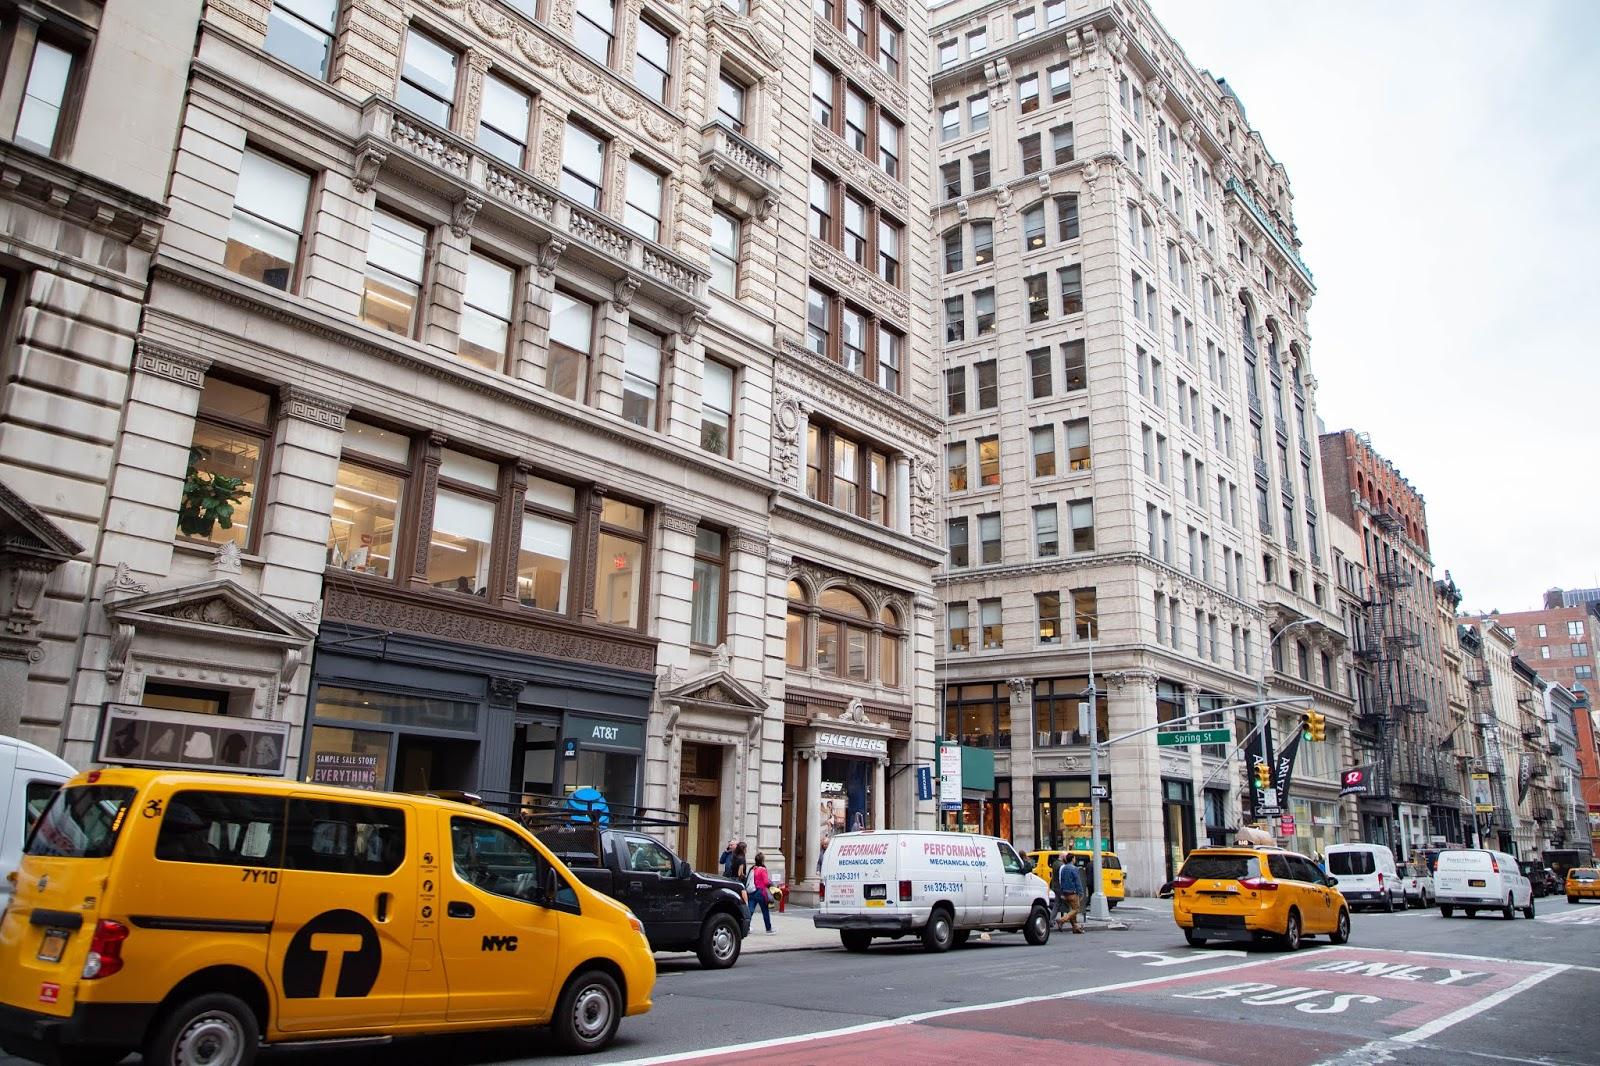 https://www.notebook.ldmailys.com/2020/03/new-york-city-manhattan-1.html